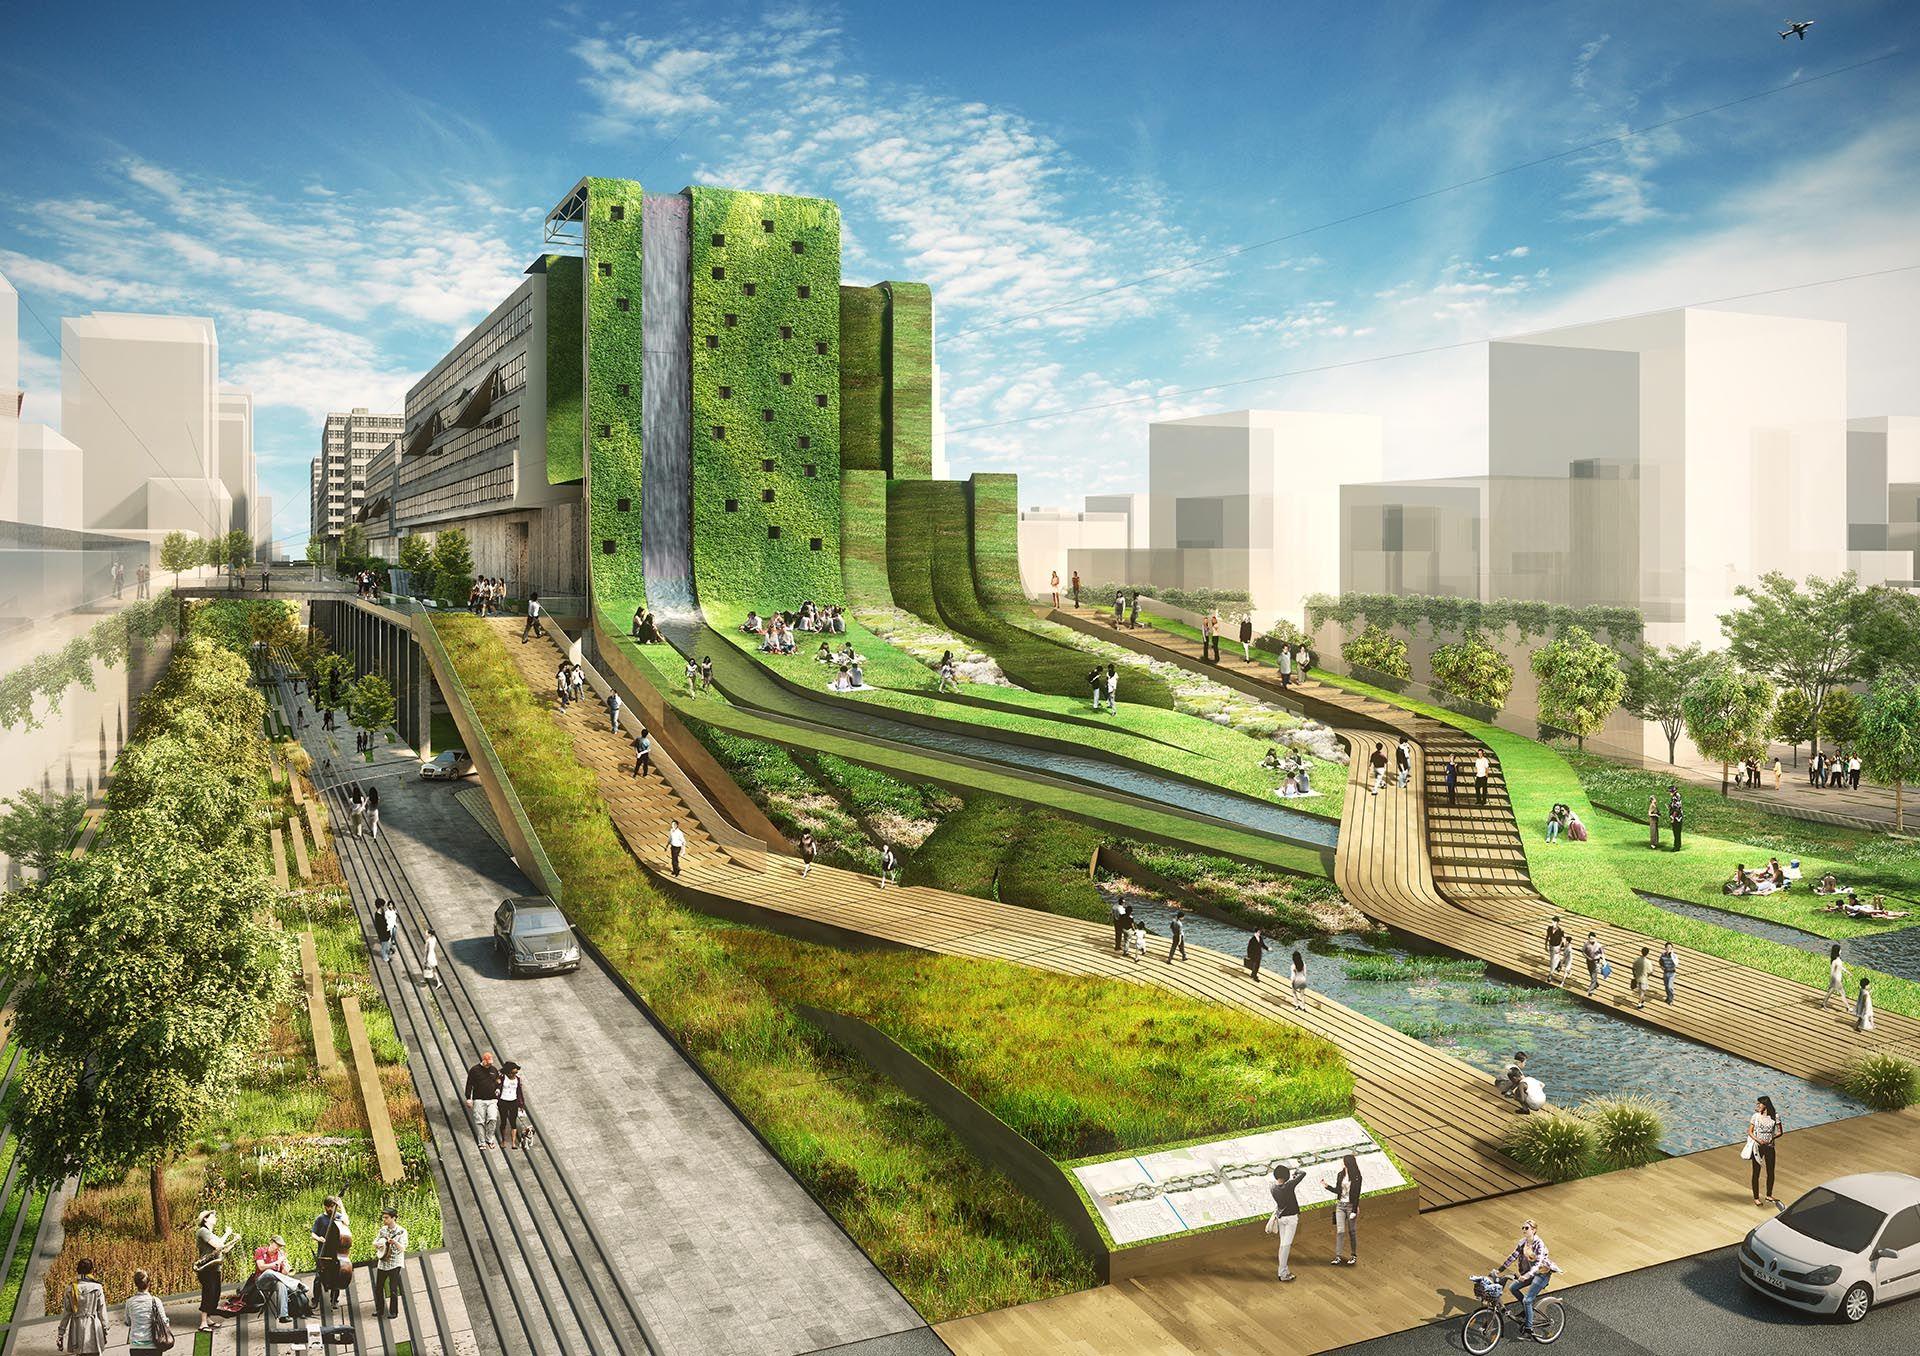 1000 Ideas About Landscape And Urbanism On Pinterest Landscape